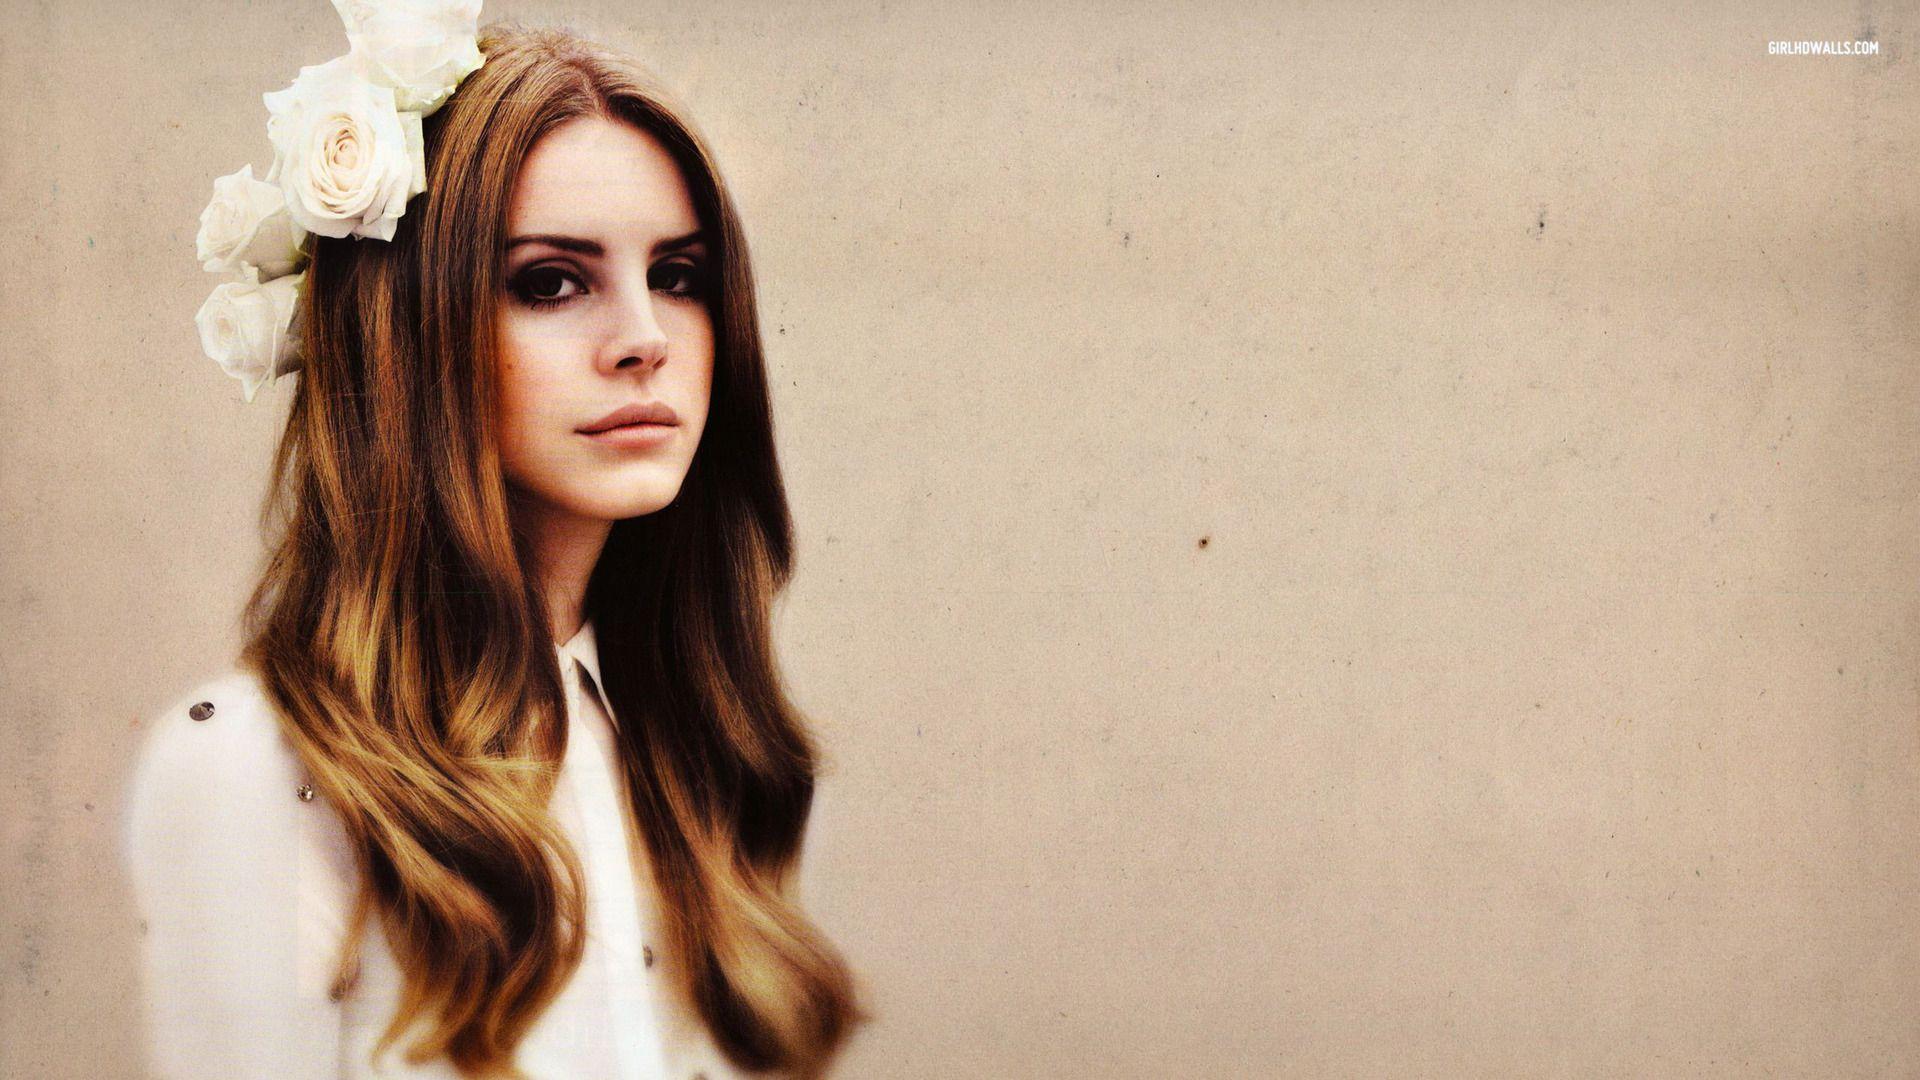 Lana Del Rey Wallpapers 1920 1080 Lana Del Rey Lana Del Rey